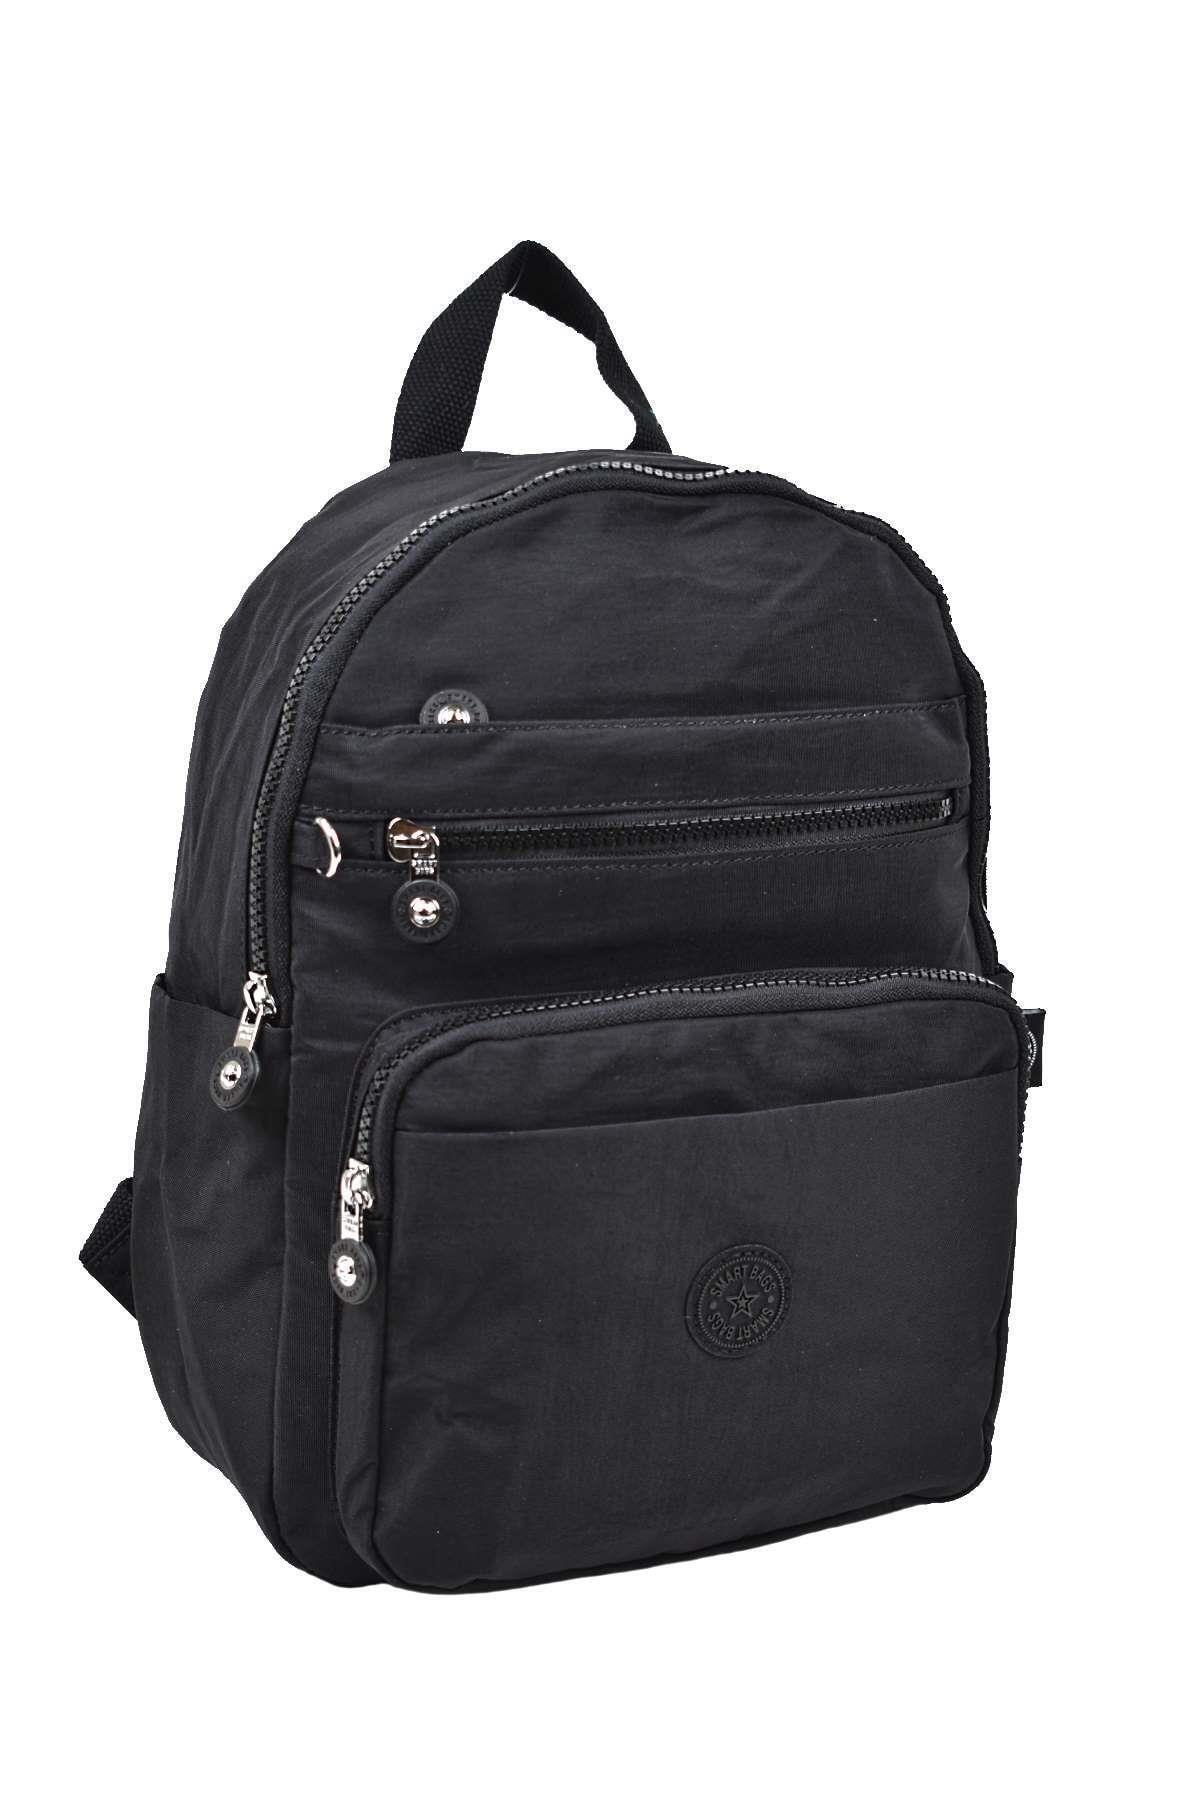 SMART BAGS Sırt Çantası Siyah 3060 2